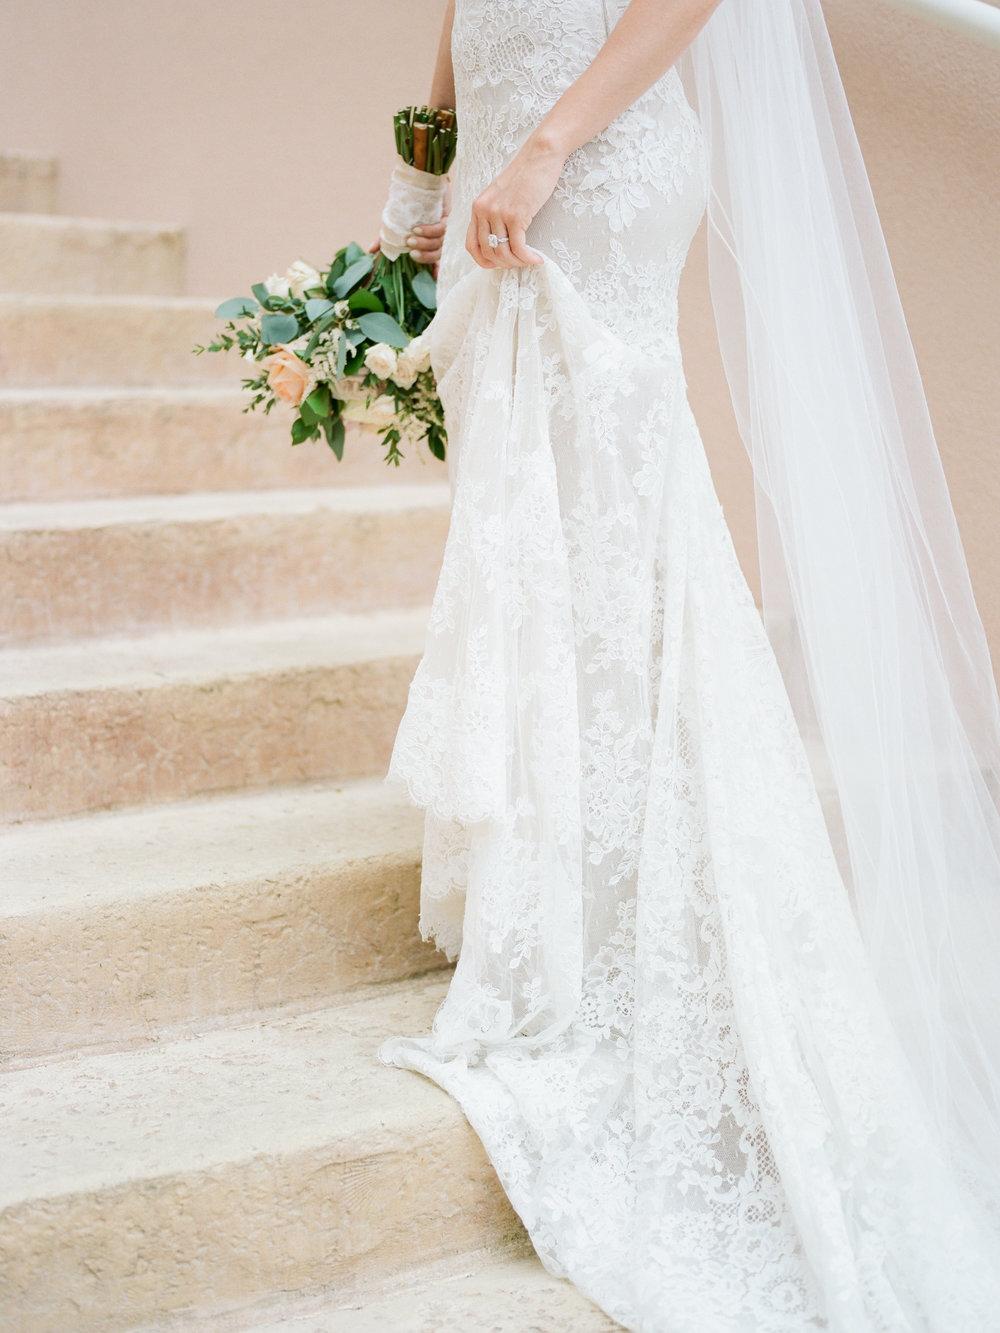 kaitlyn_and_jacobie_hammock_beach_lodge_palm_coast_florida_wedding_photographer_shannon_griffin_details-94.jpg